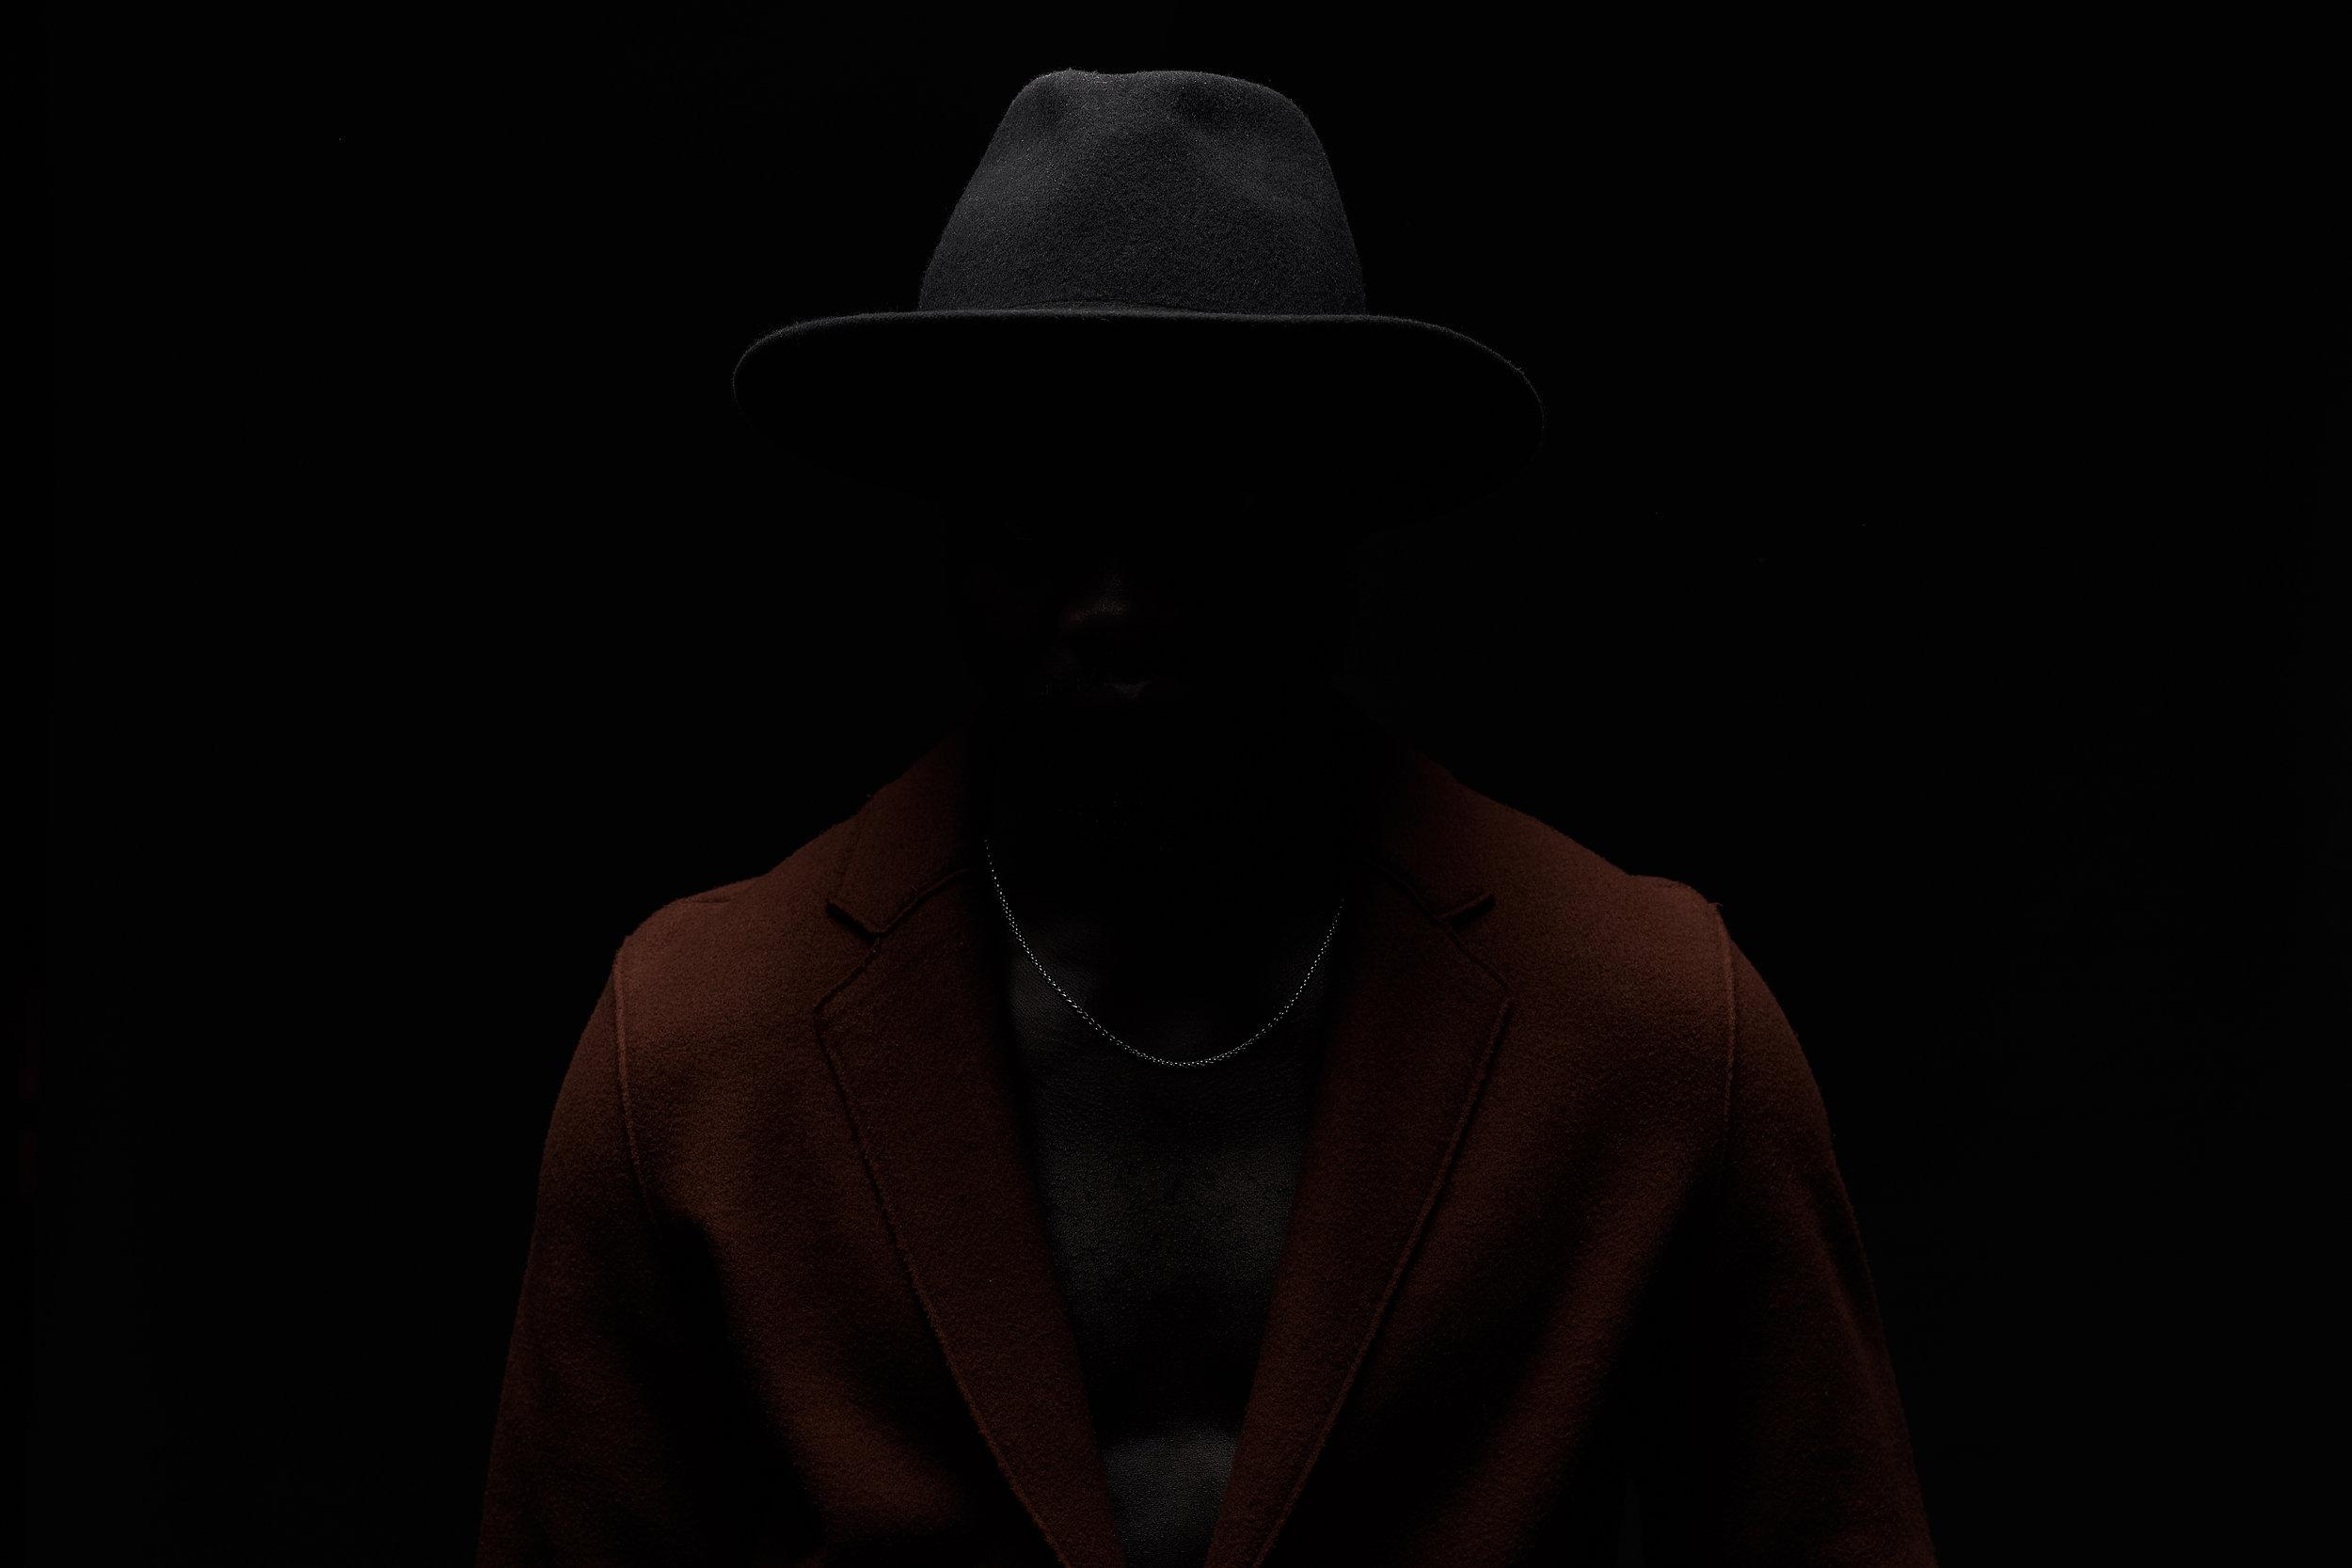 Man in the dark. Dark key portrait of black man on black background. Man dressed in black hat and brown coat